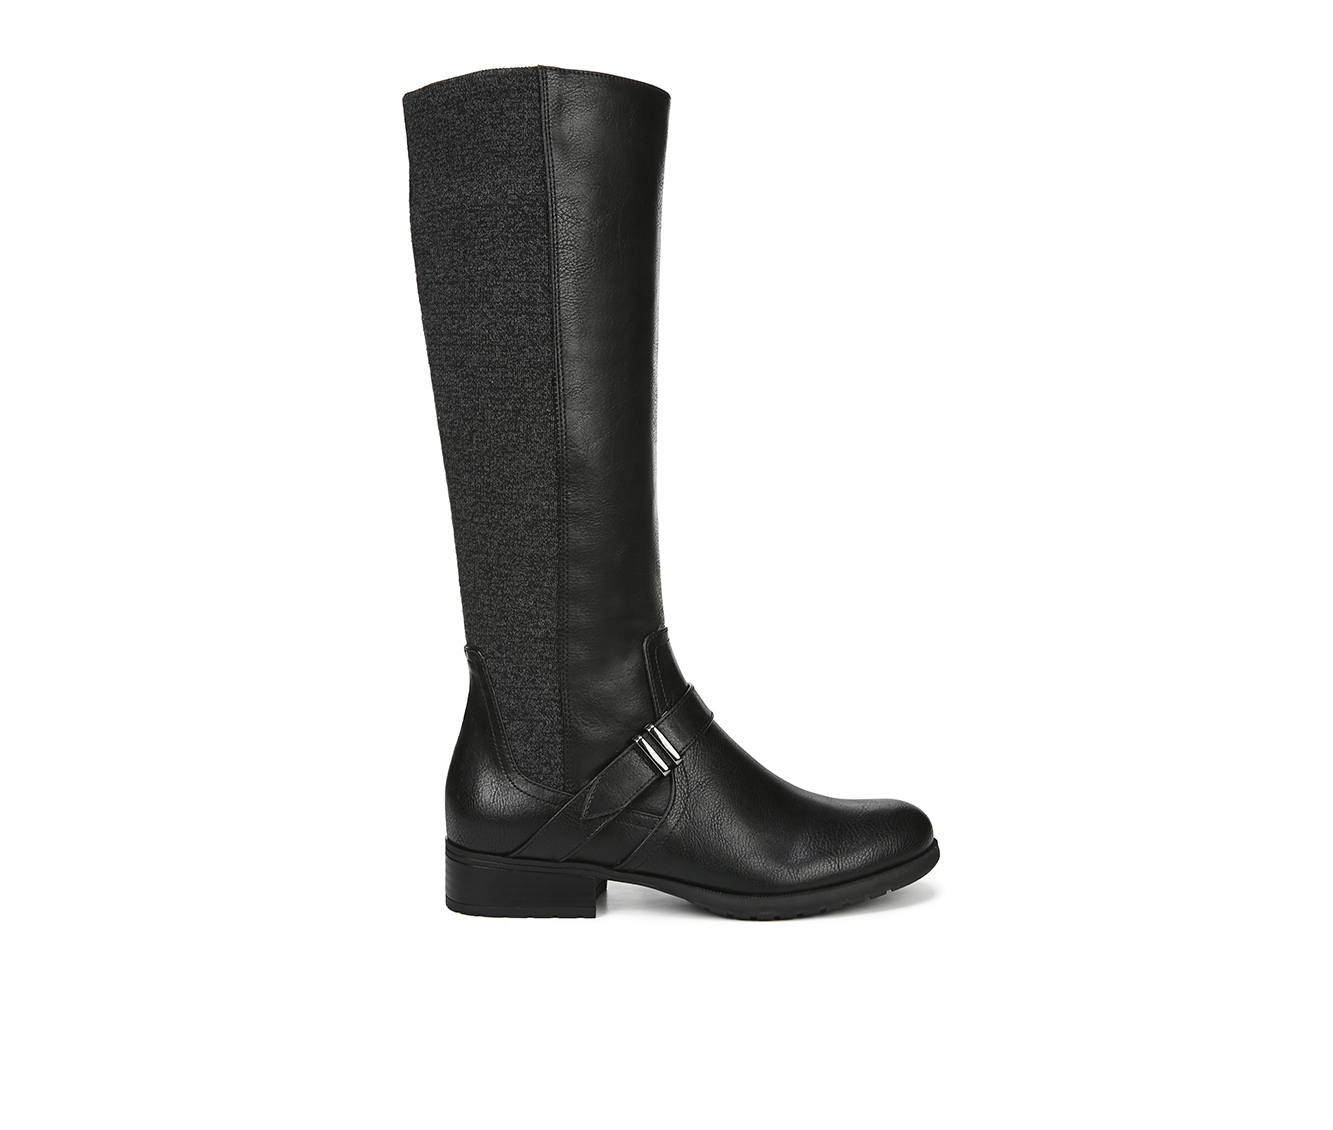 LifeStride Xtra Women's Boot (Black)